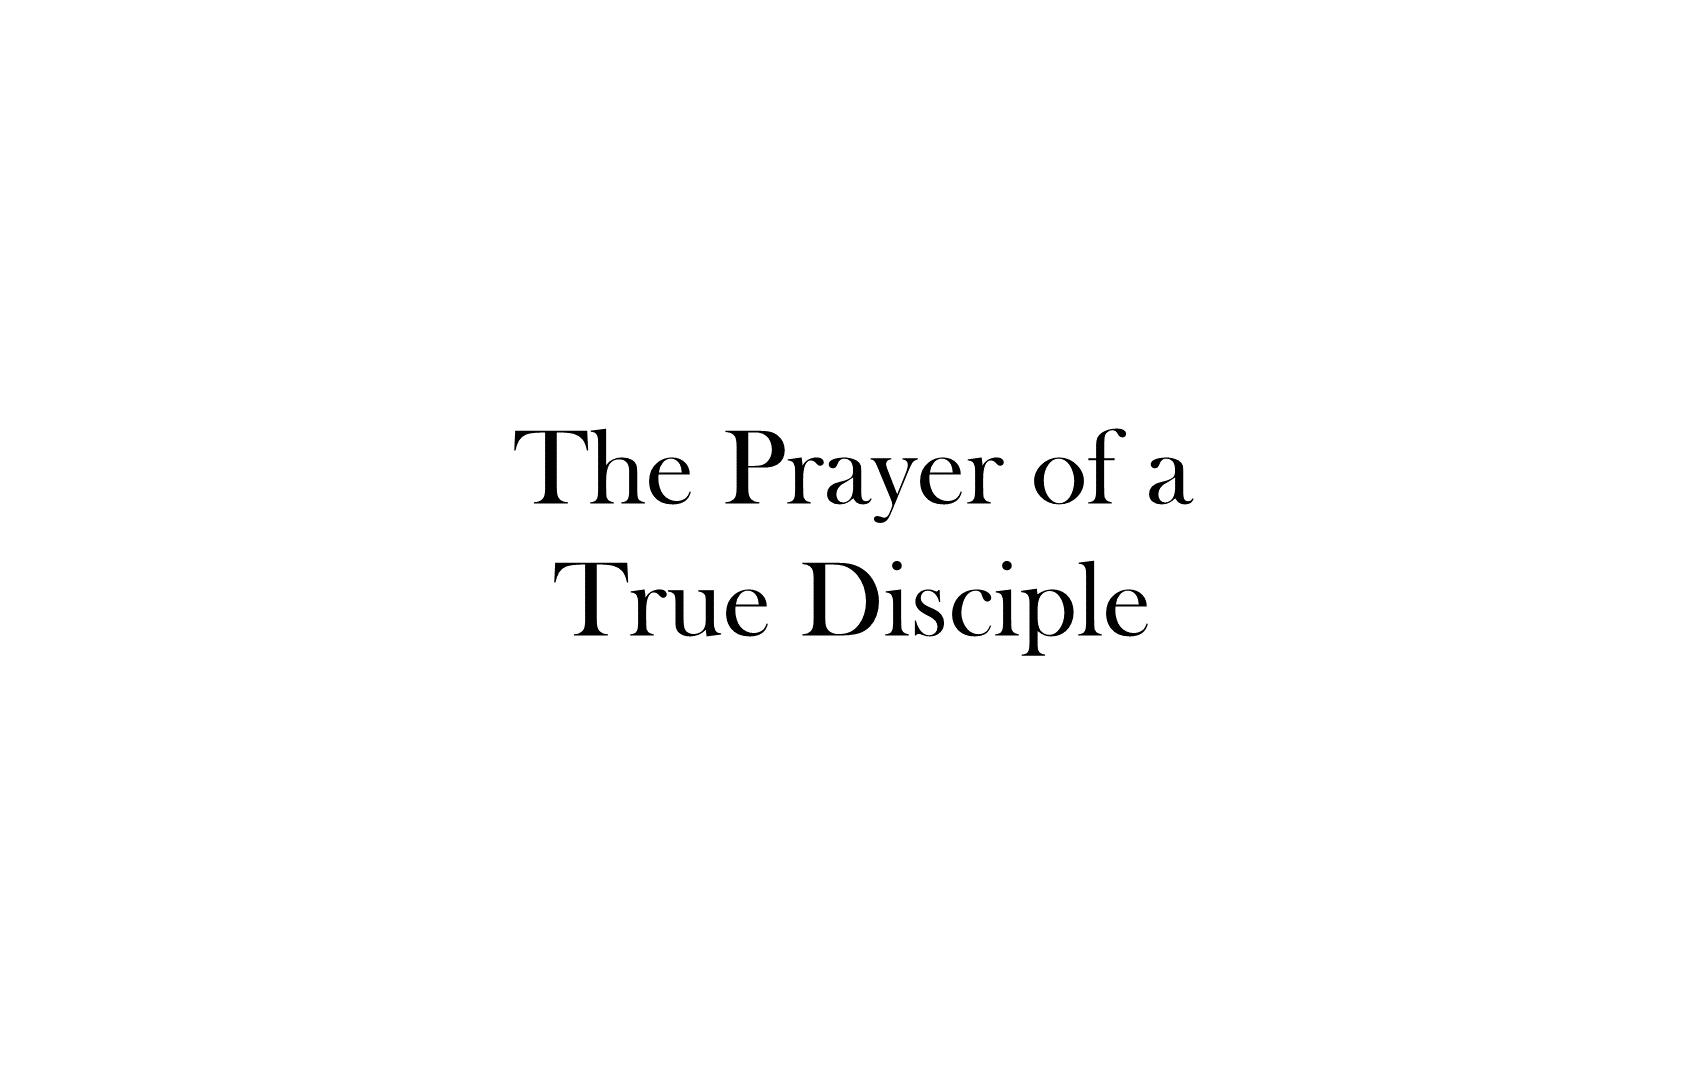 ESH-20 - The Discipline Of Disciple-Making - Seeing, Understanding, Entering, Living, & Seeking The Kingdom Of God ( (24)